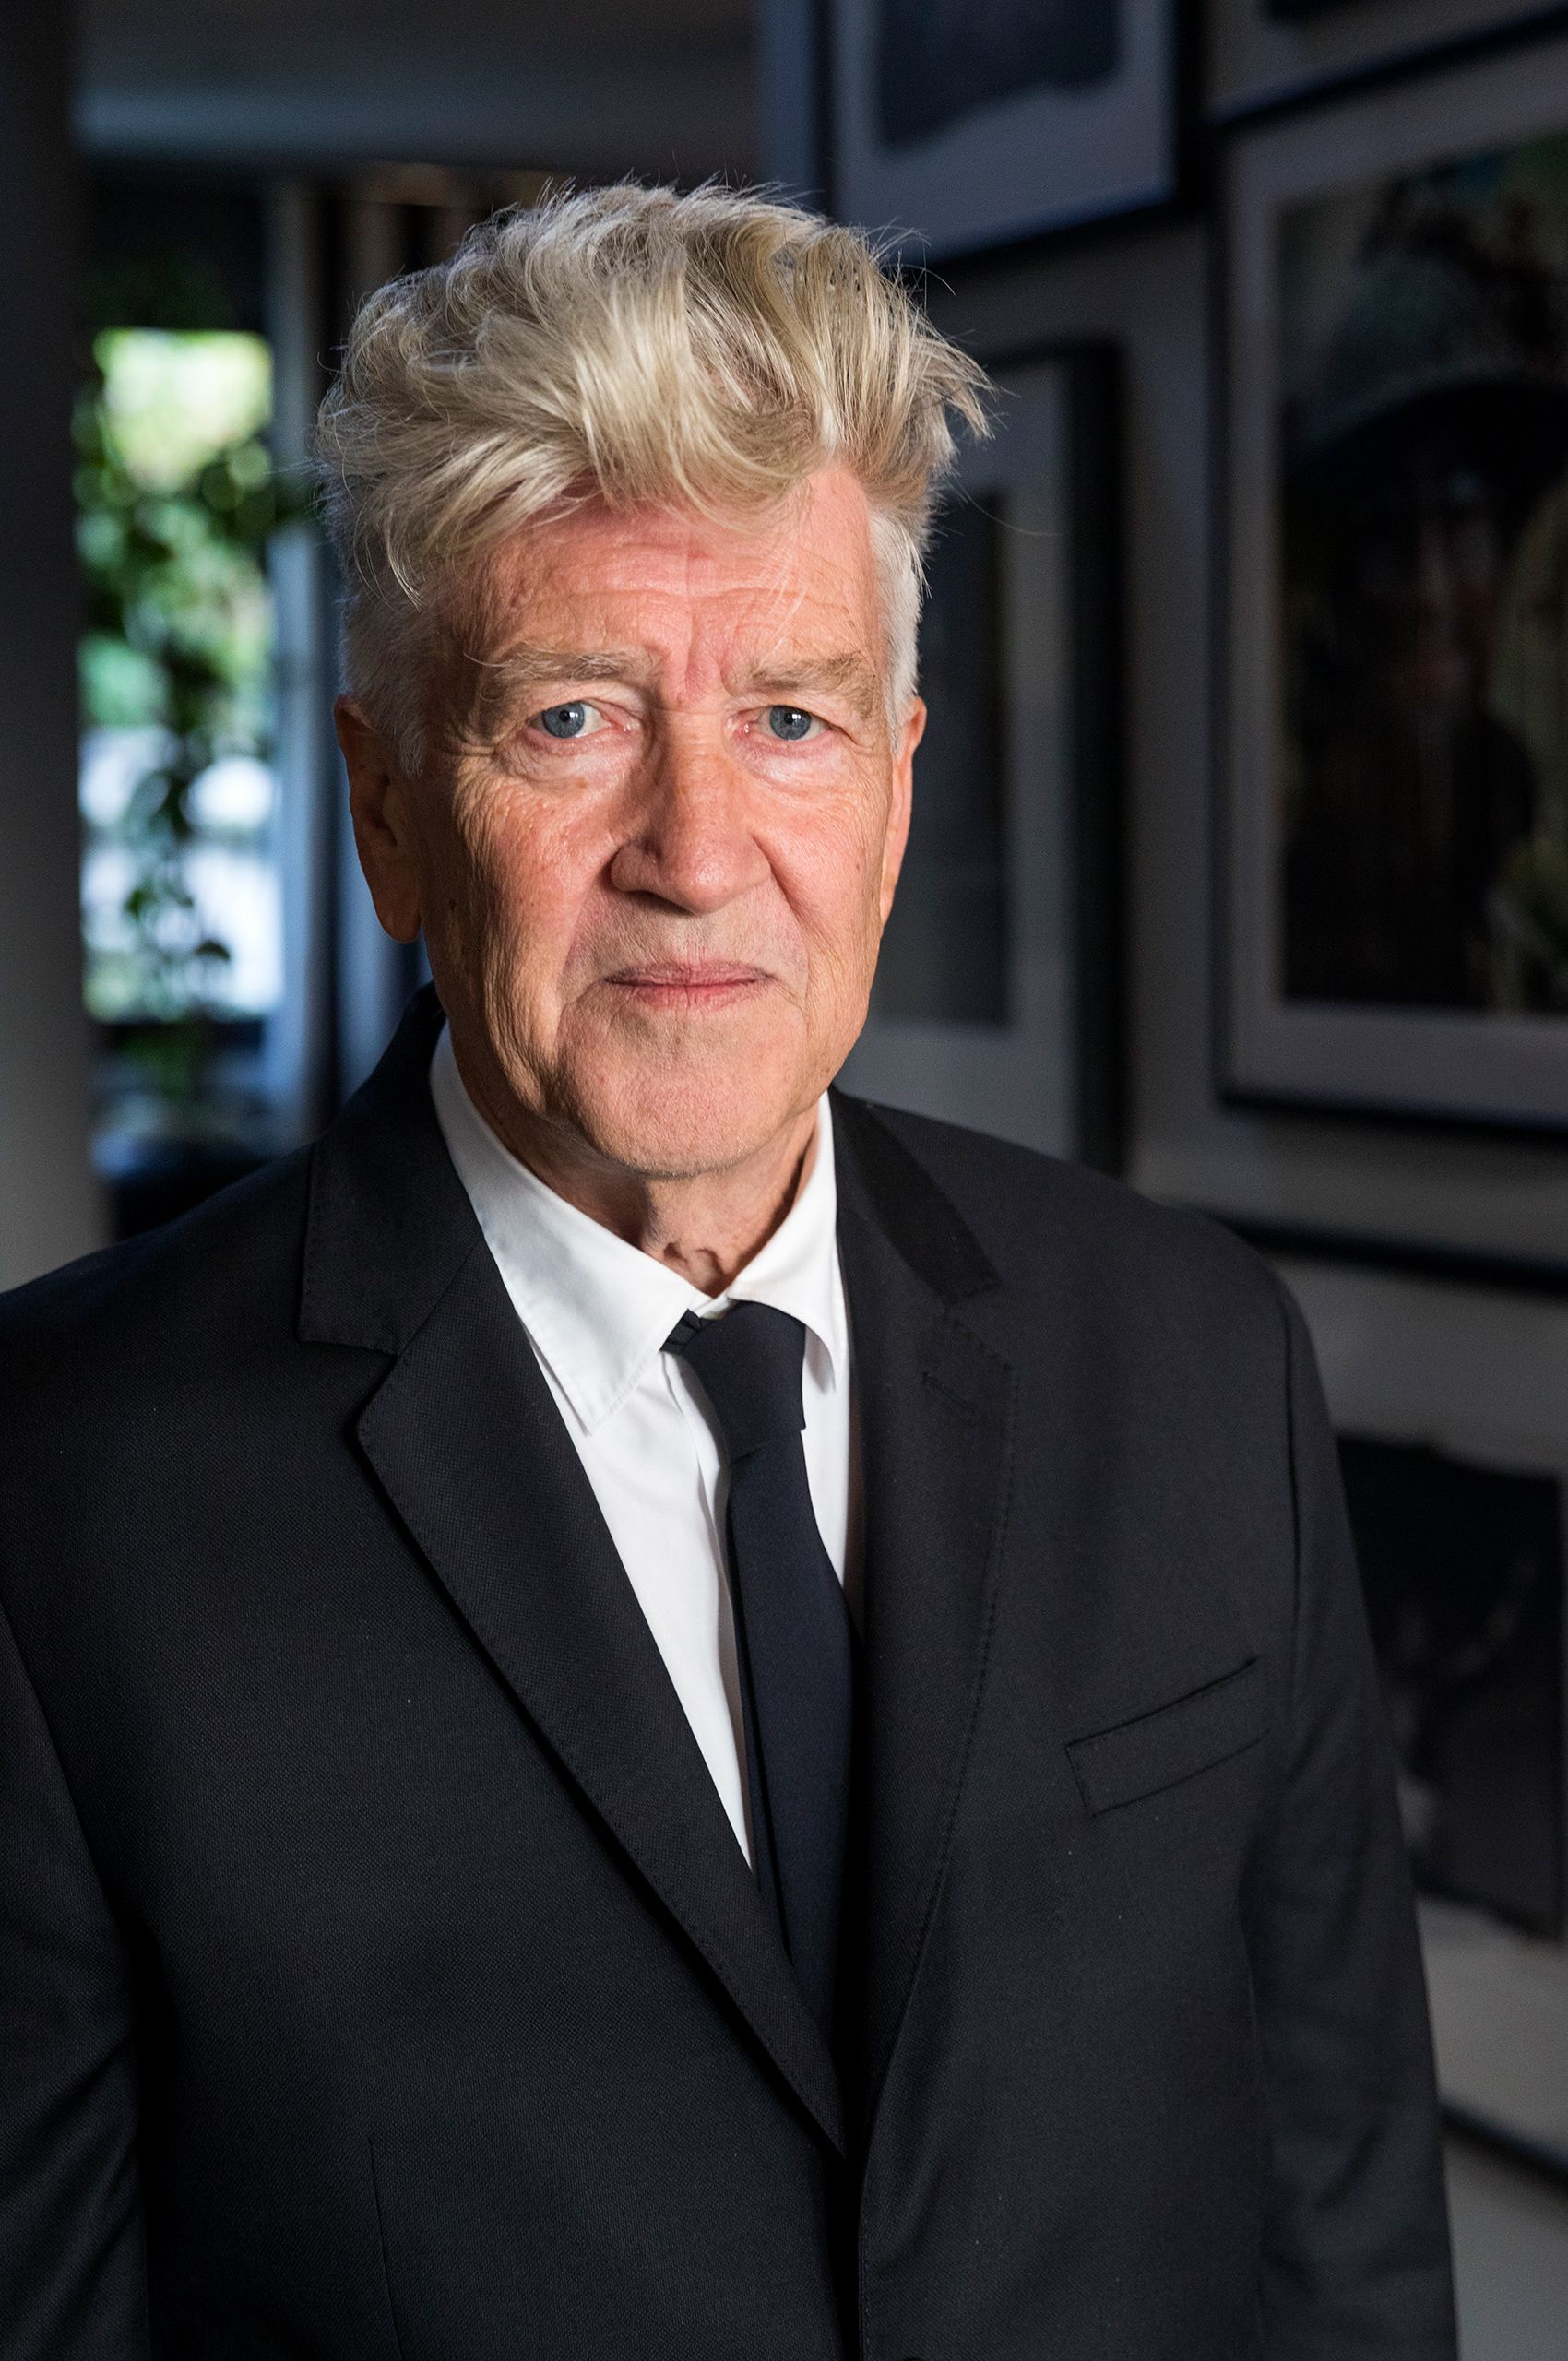 David Lynch for KCRW